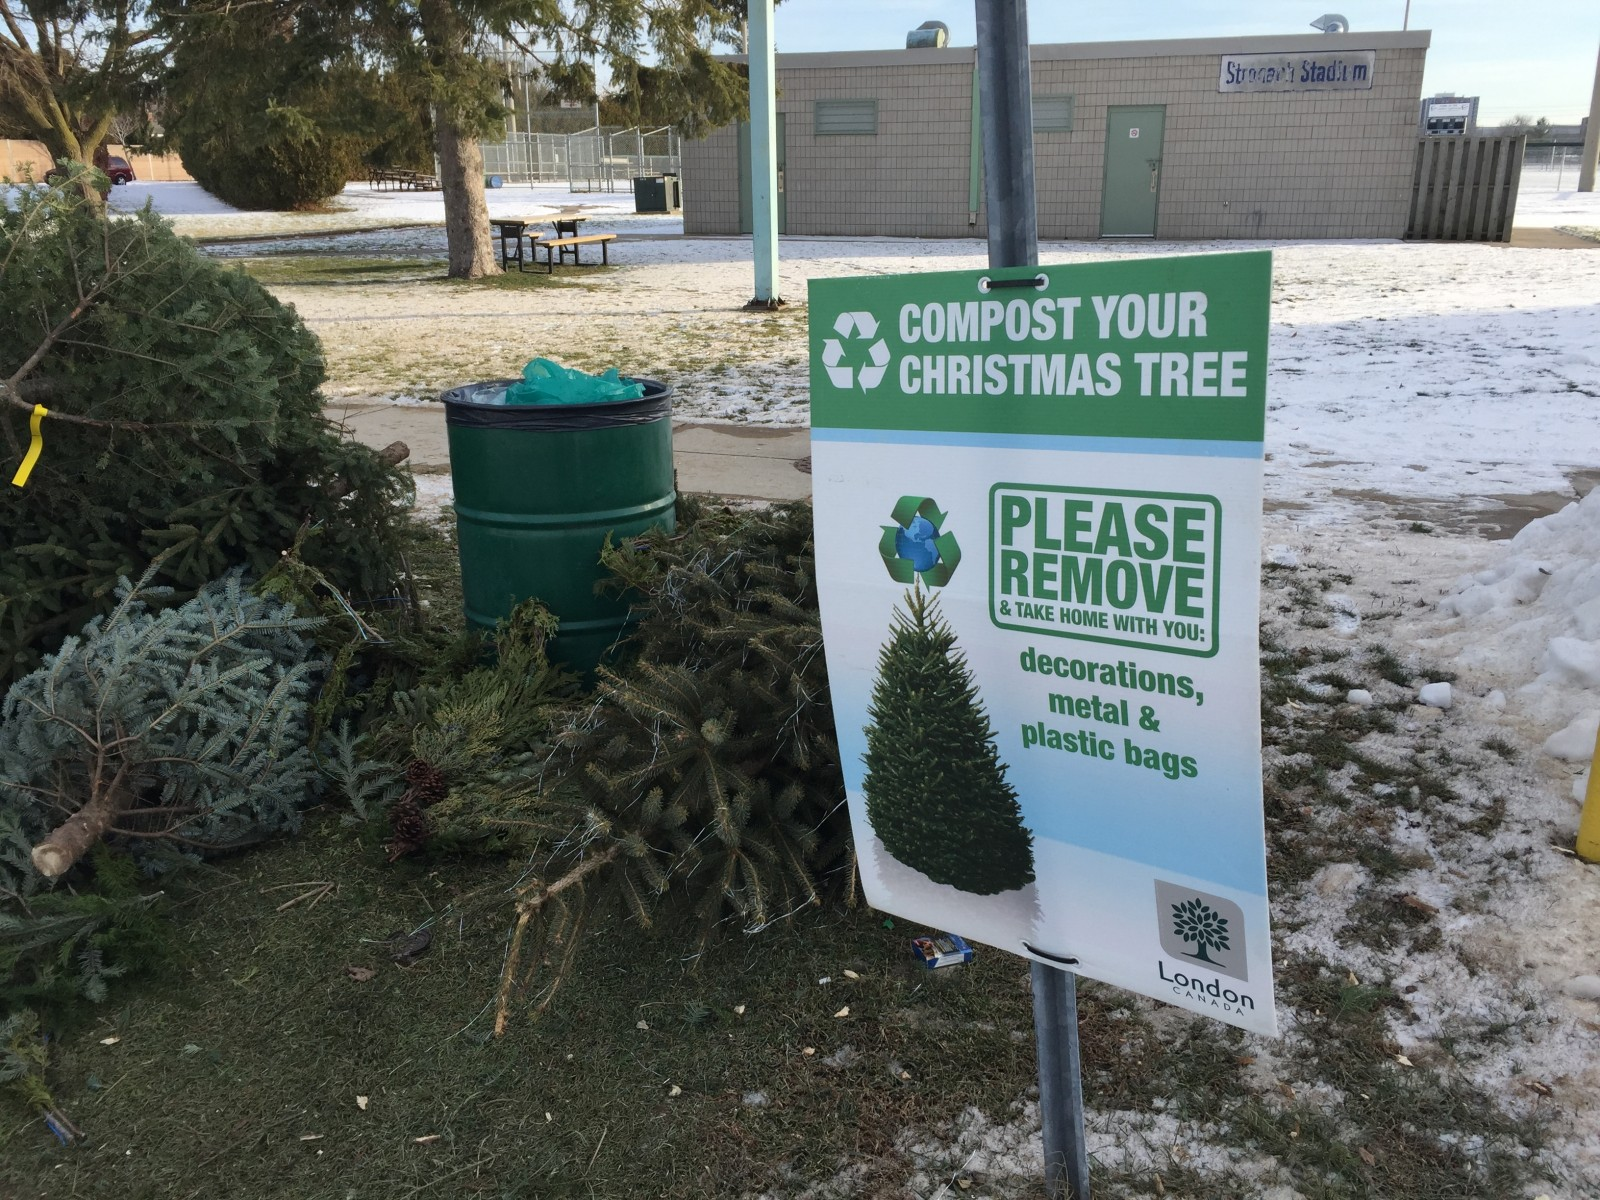 London's options for Christmas tree disposal